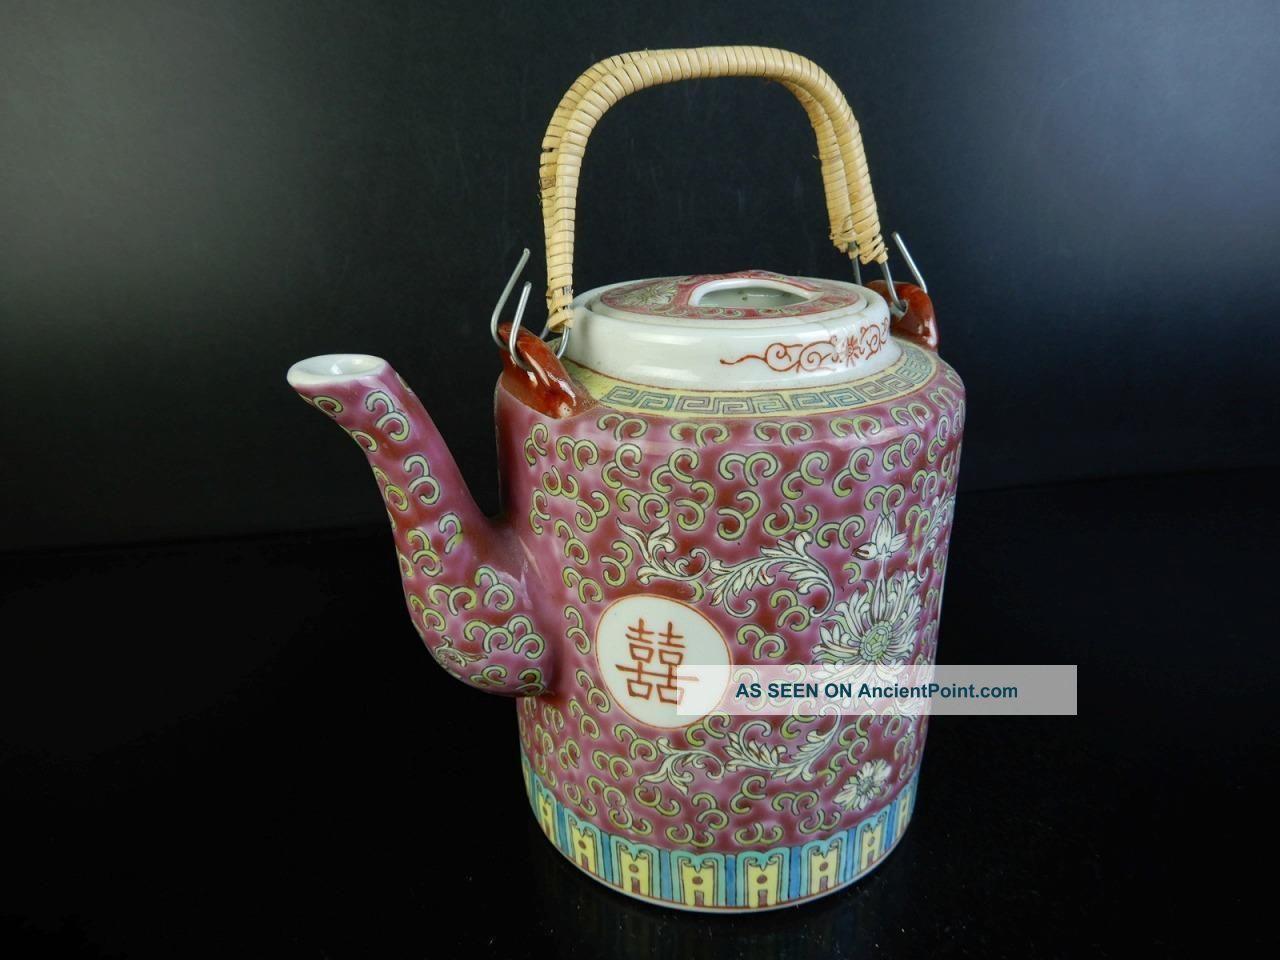 H2714: Chinese Colored Porcelain Flower Arabesque Pattern Teapot Kyusu Sencha Teapots photo